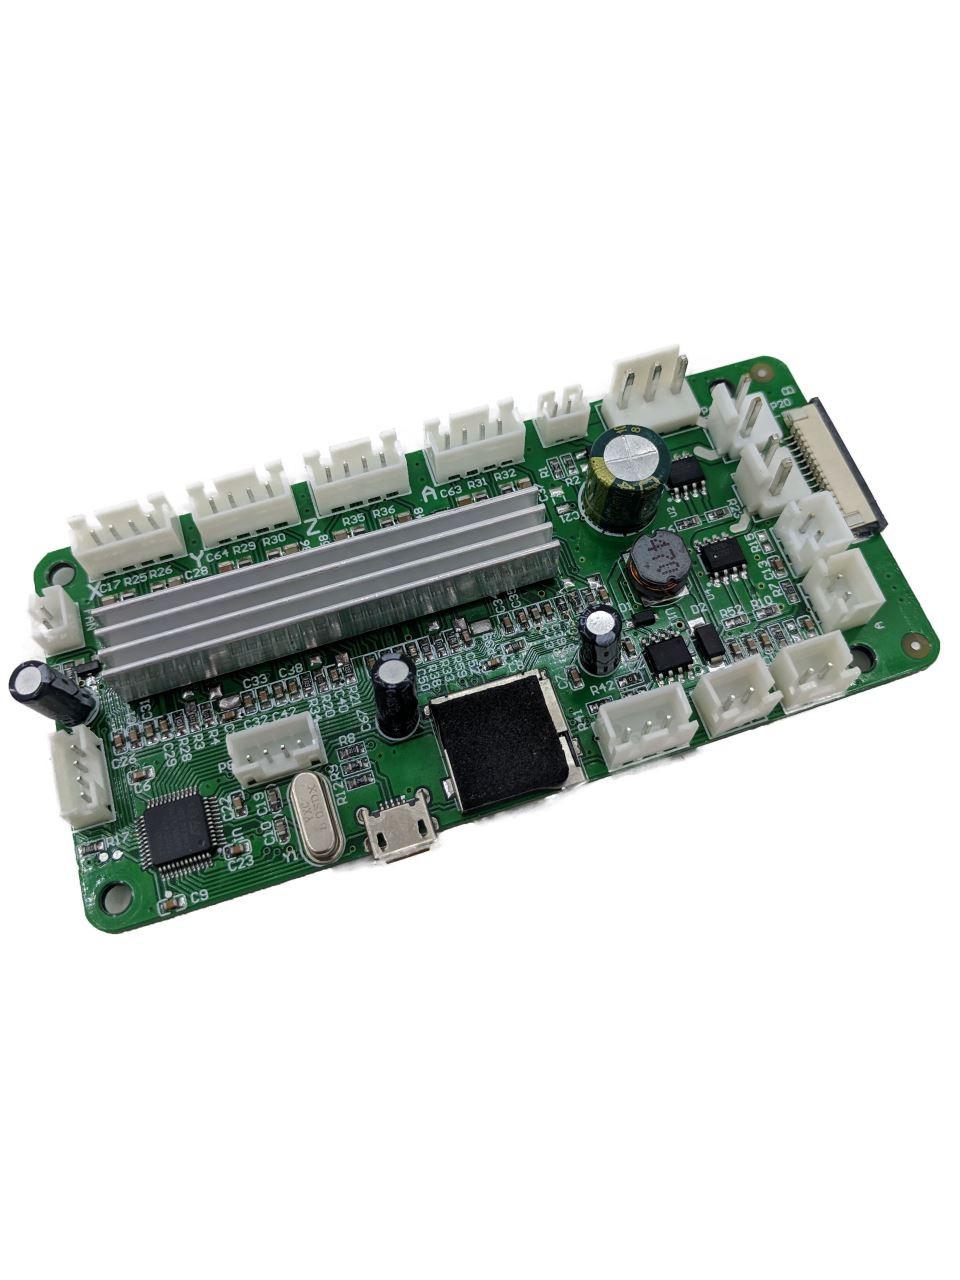 Mainboard - Select Mini V1 - Normal or \